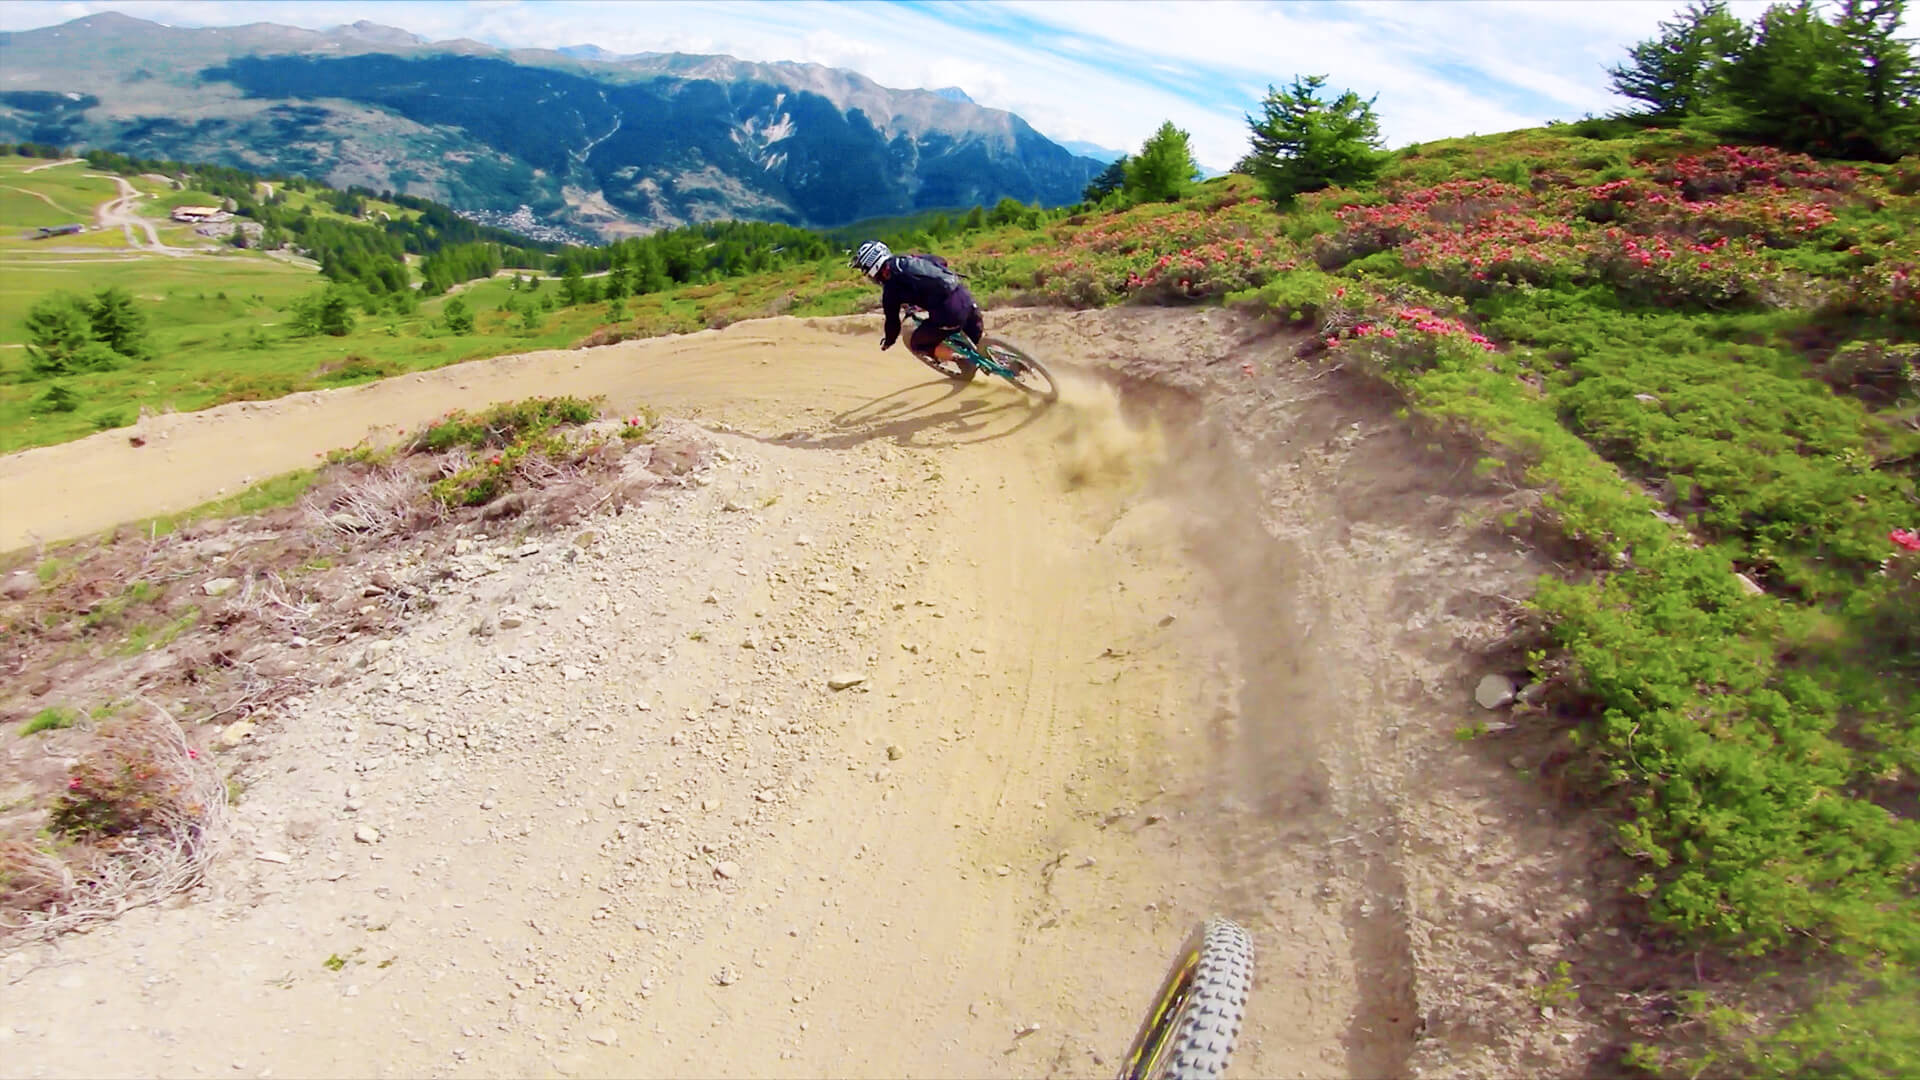 la-ricelle-serre-chevalier-bike-park-france-photo-3-HD